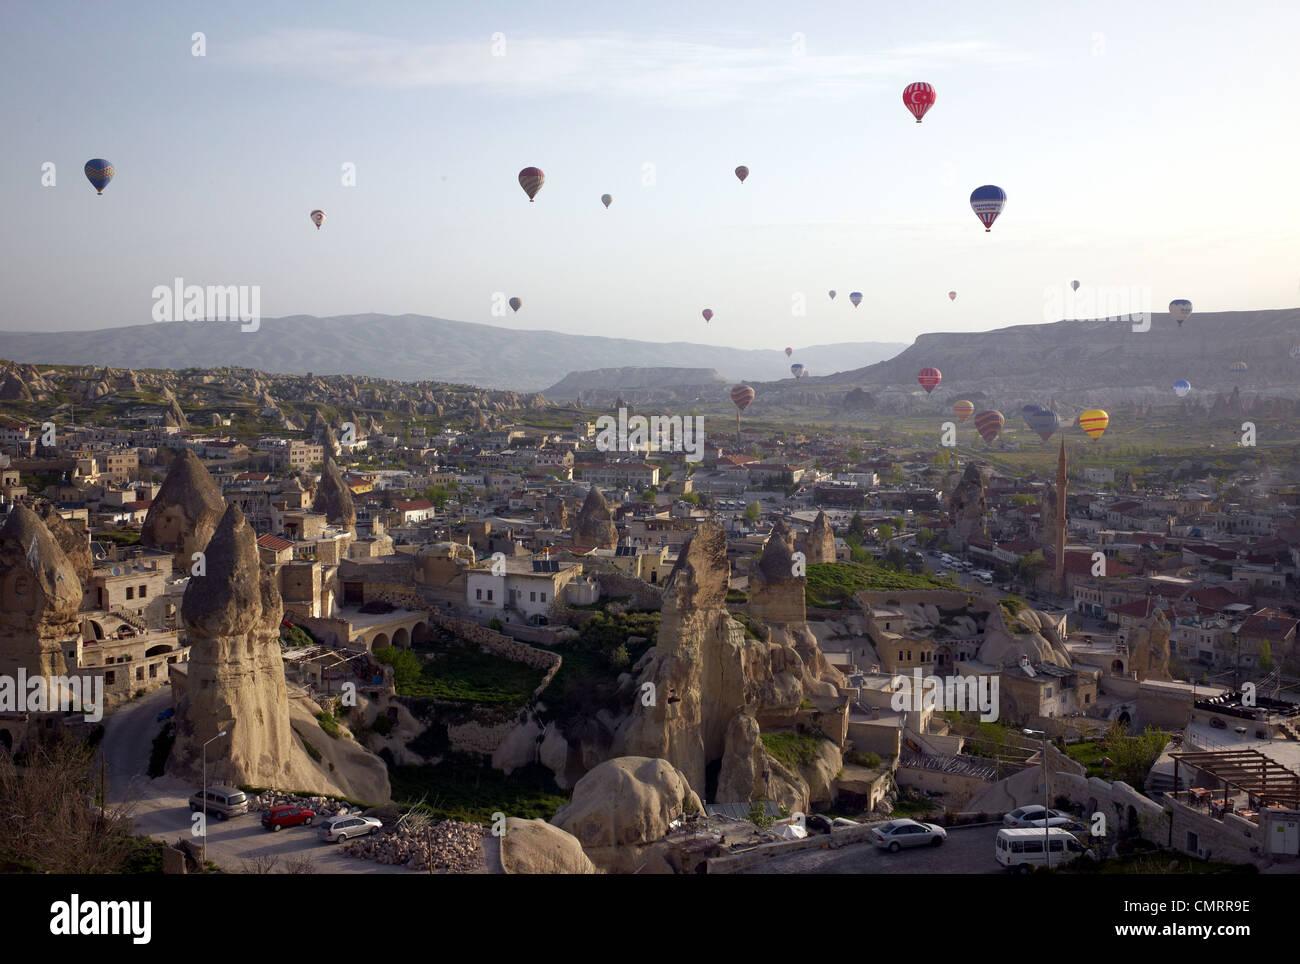 Floating Hot Air Balloons Cappadocia Turkey